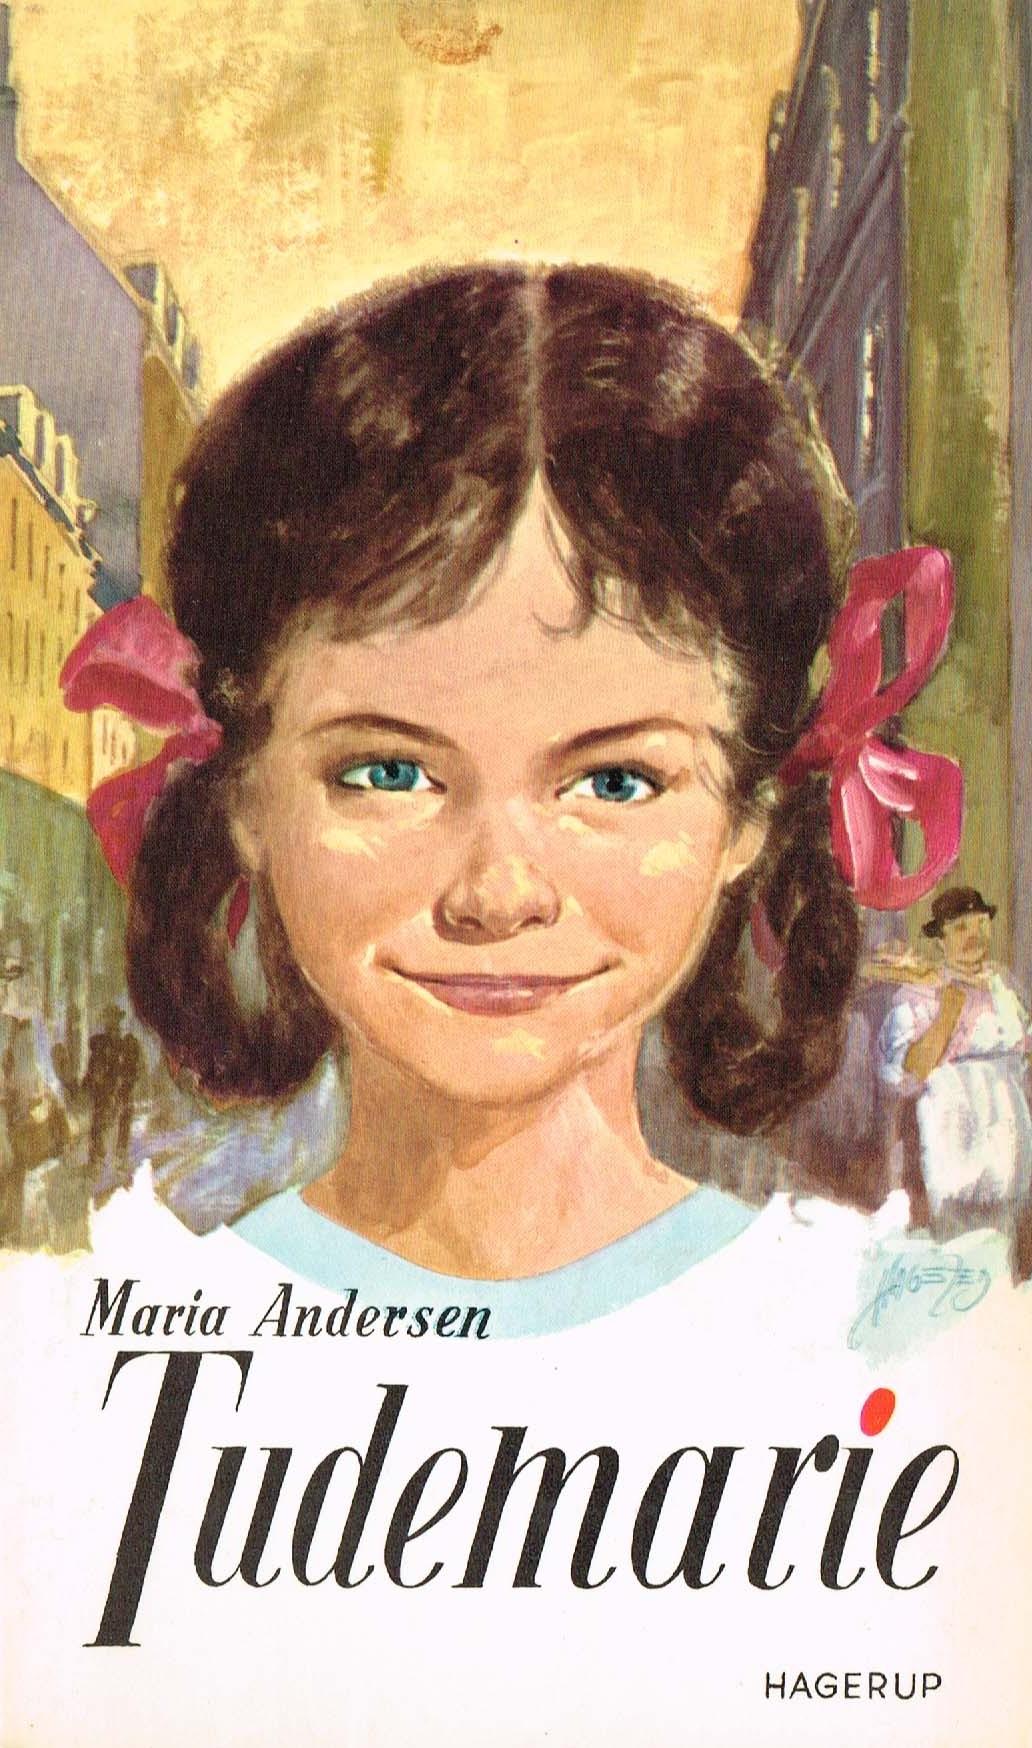 Maria Andersen Tudemarie